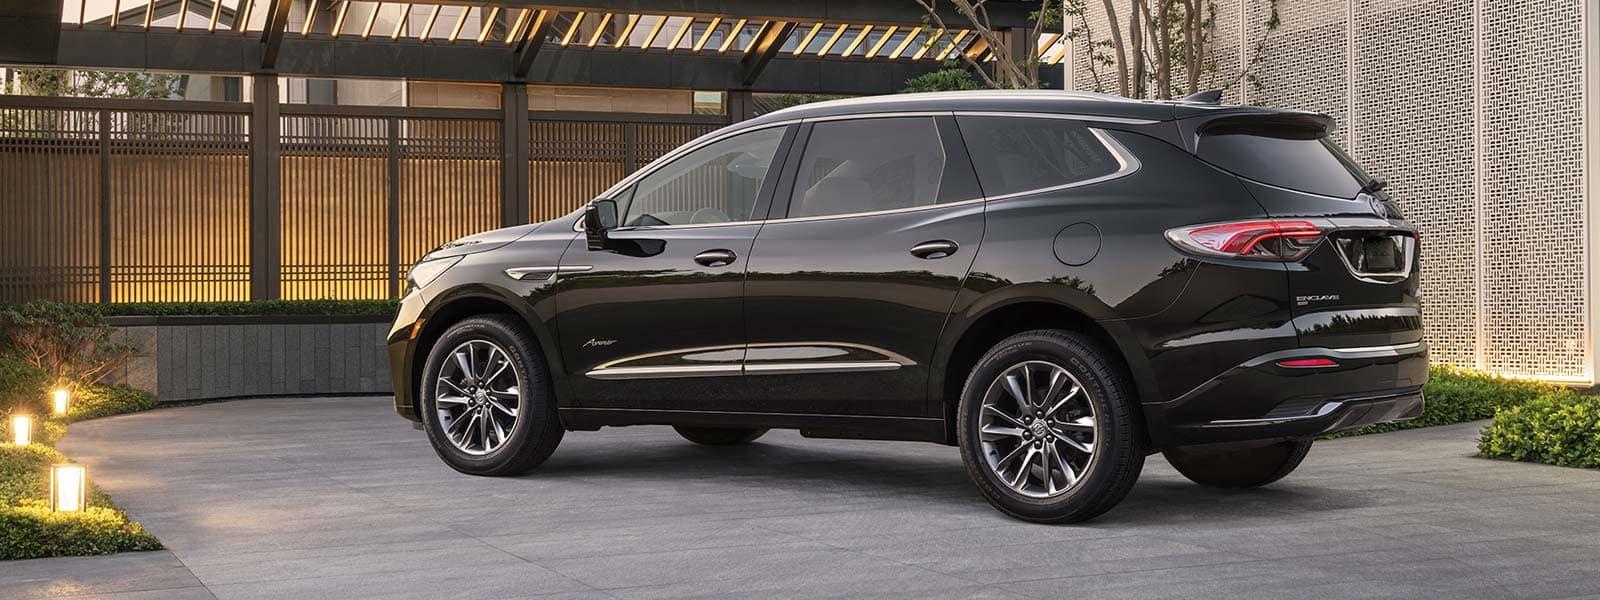 Lease or finance new Buick Enclave in Weyburn Saskatchewan